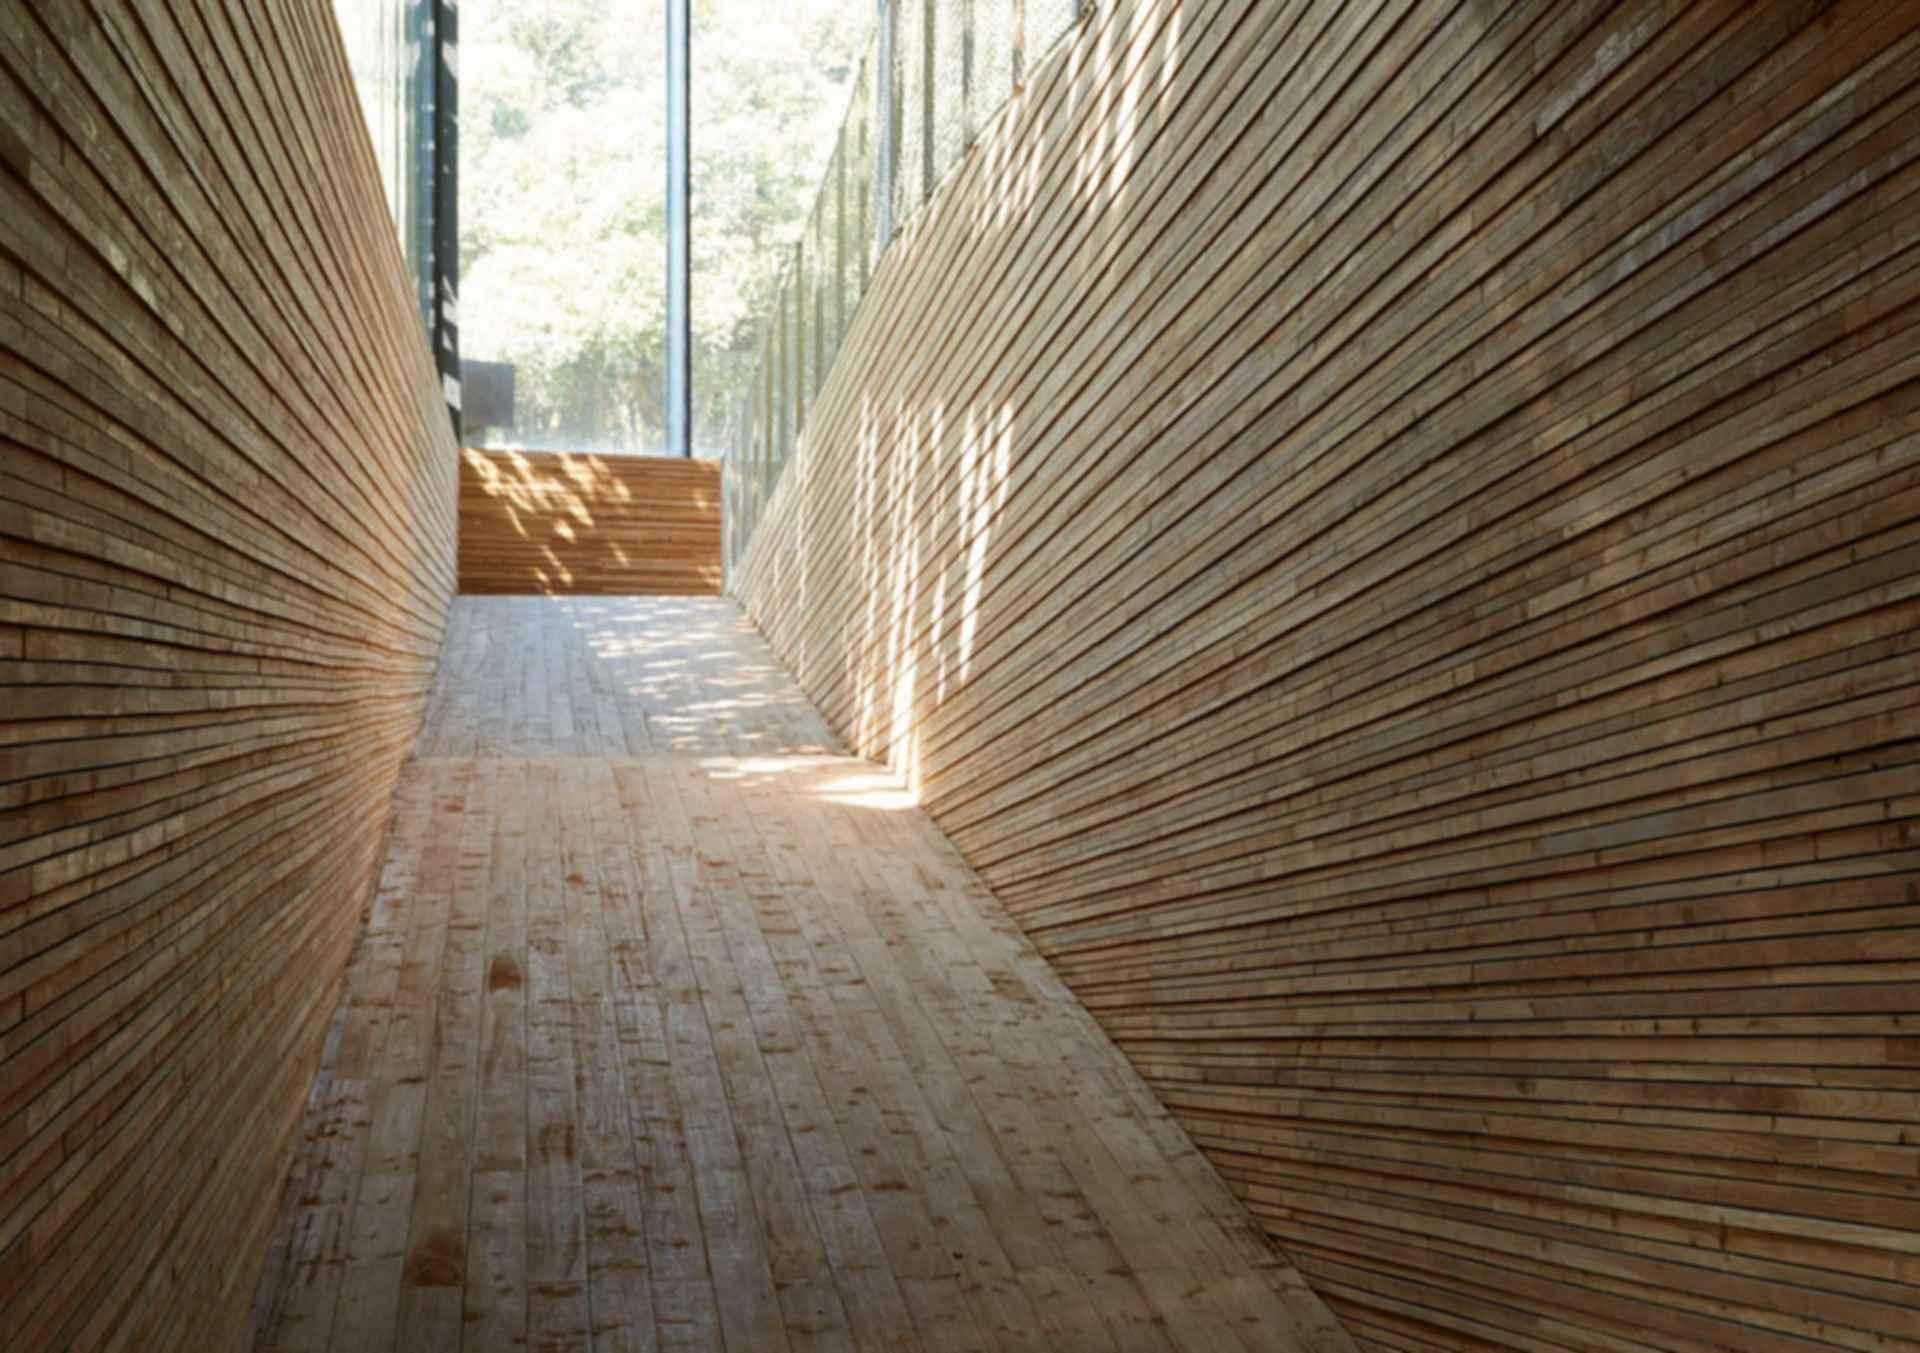 China Academy of Art's Folk Art Museum - Interior